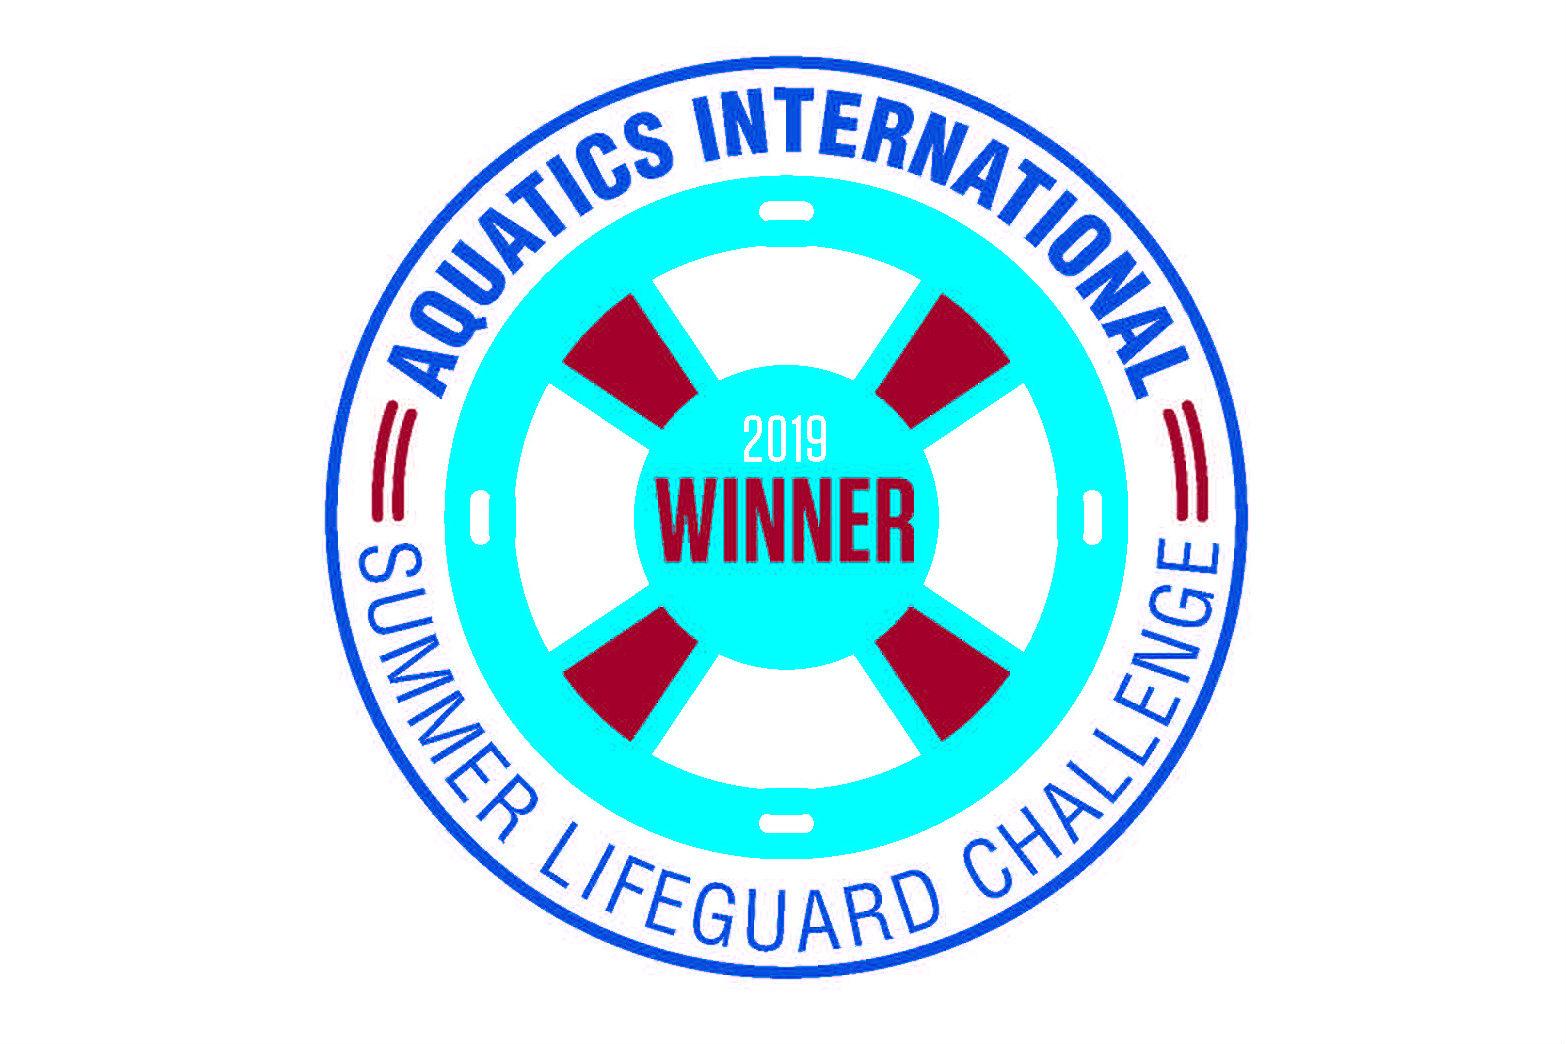 Announcing the Winner of AI's June Summer Lifeguard Challenge